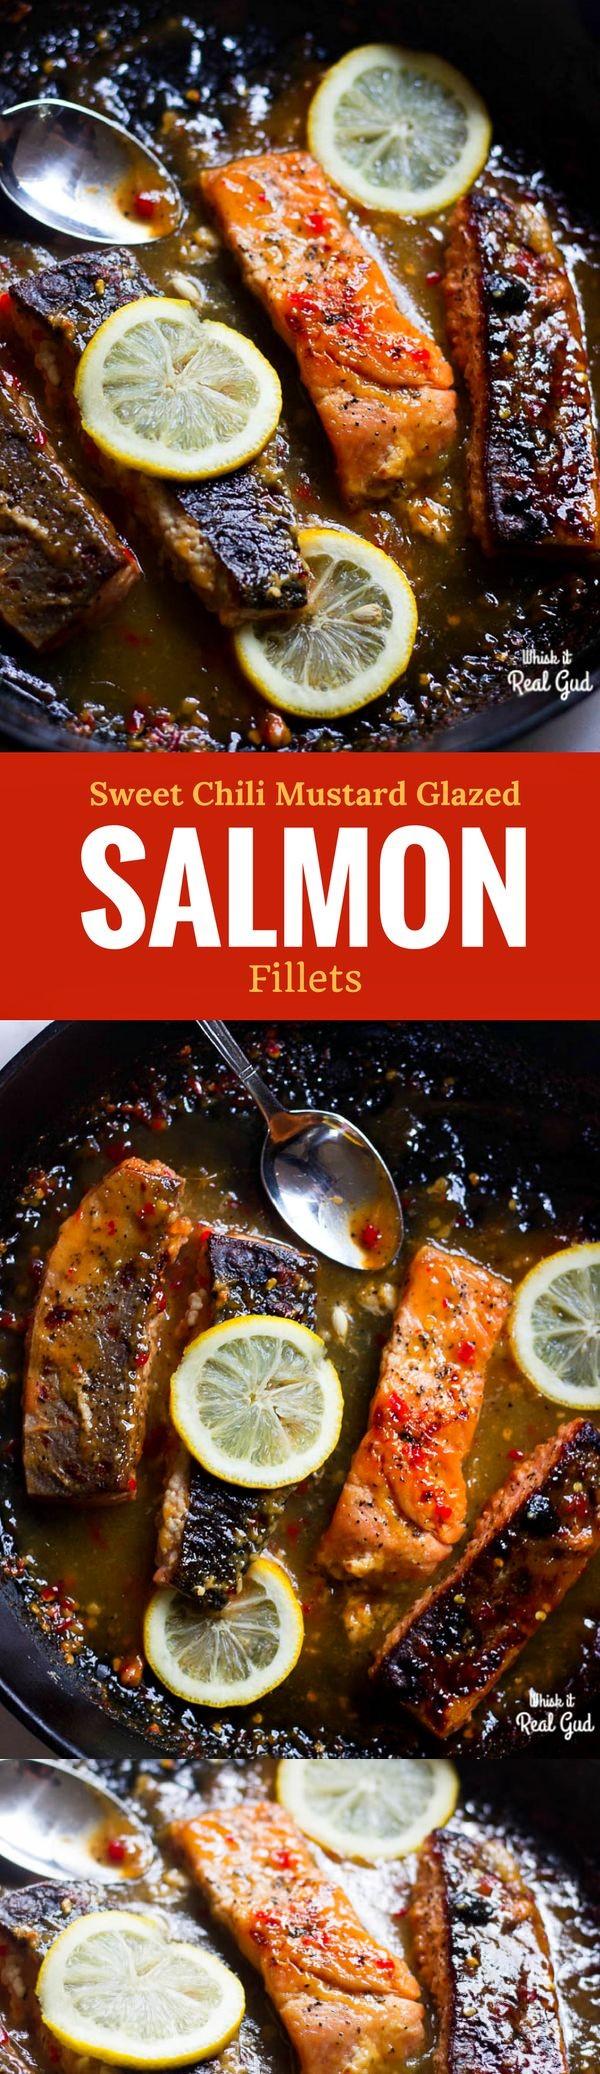 Chrissy Teigen's Sweet Chili and Mustard Glazed Salmon Fillets